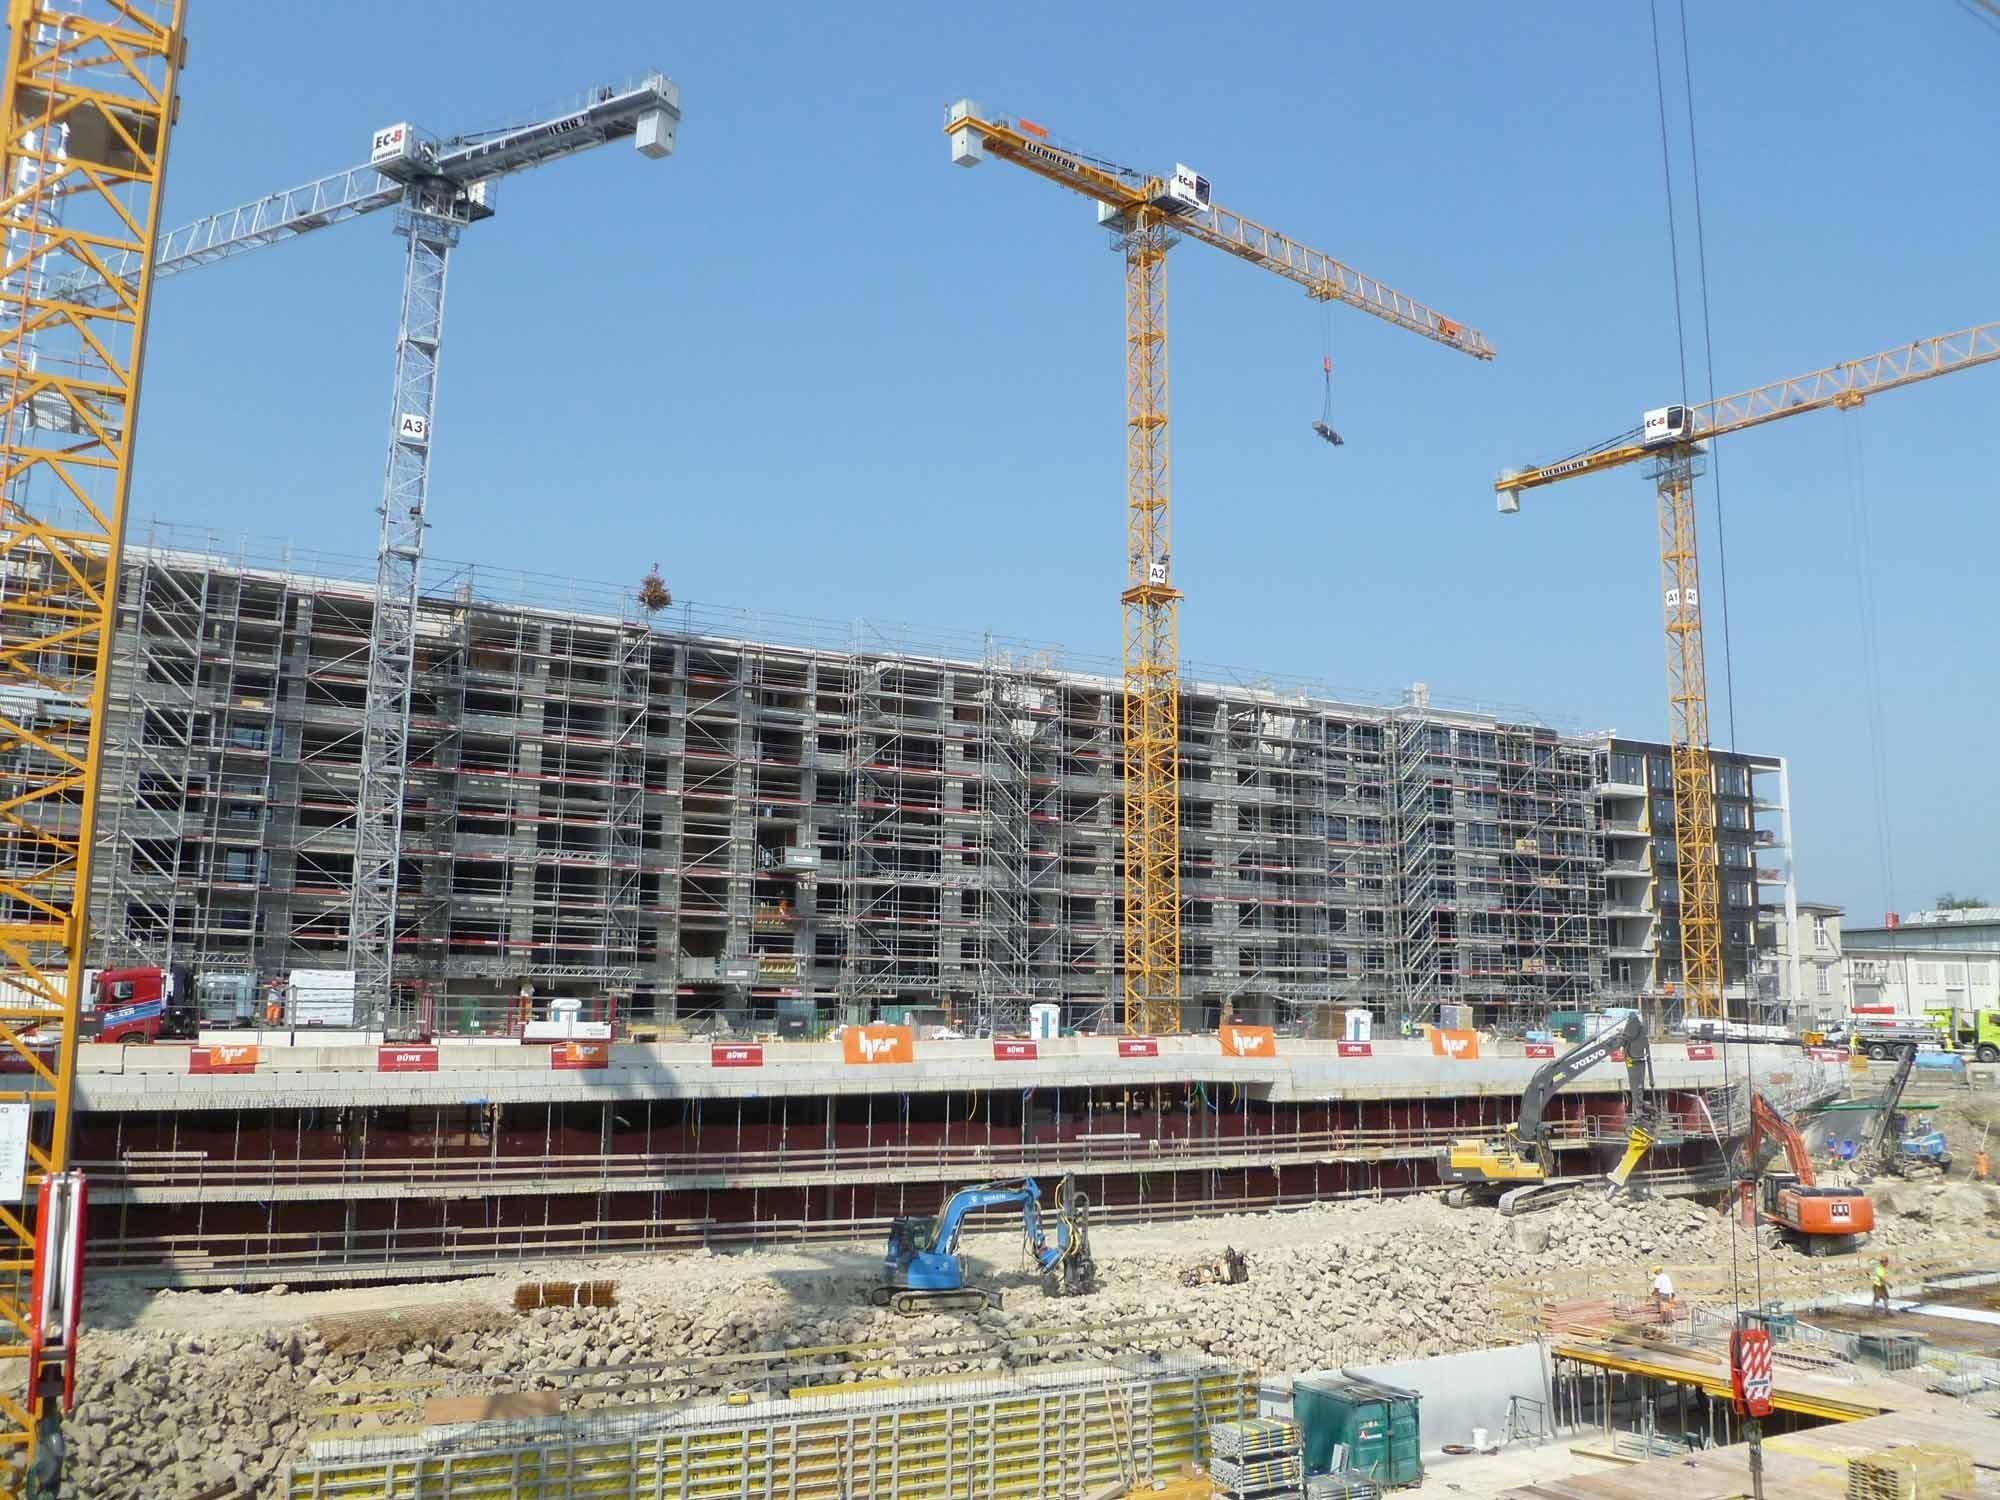 Blick auf Baustelle Papieri-Areal in Cham